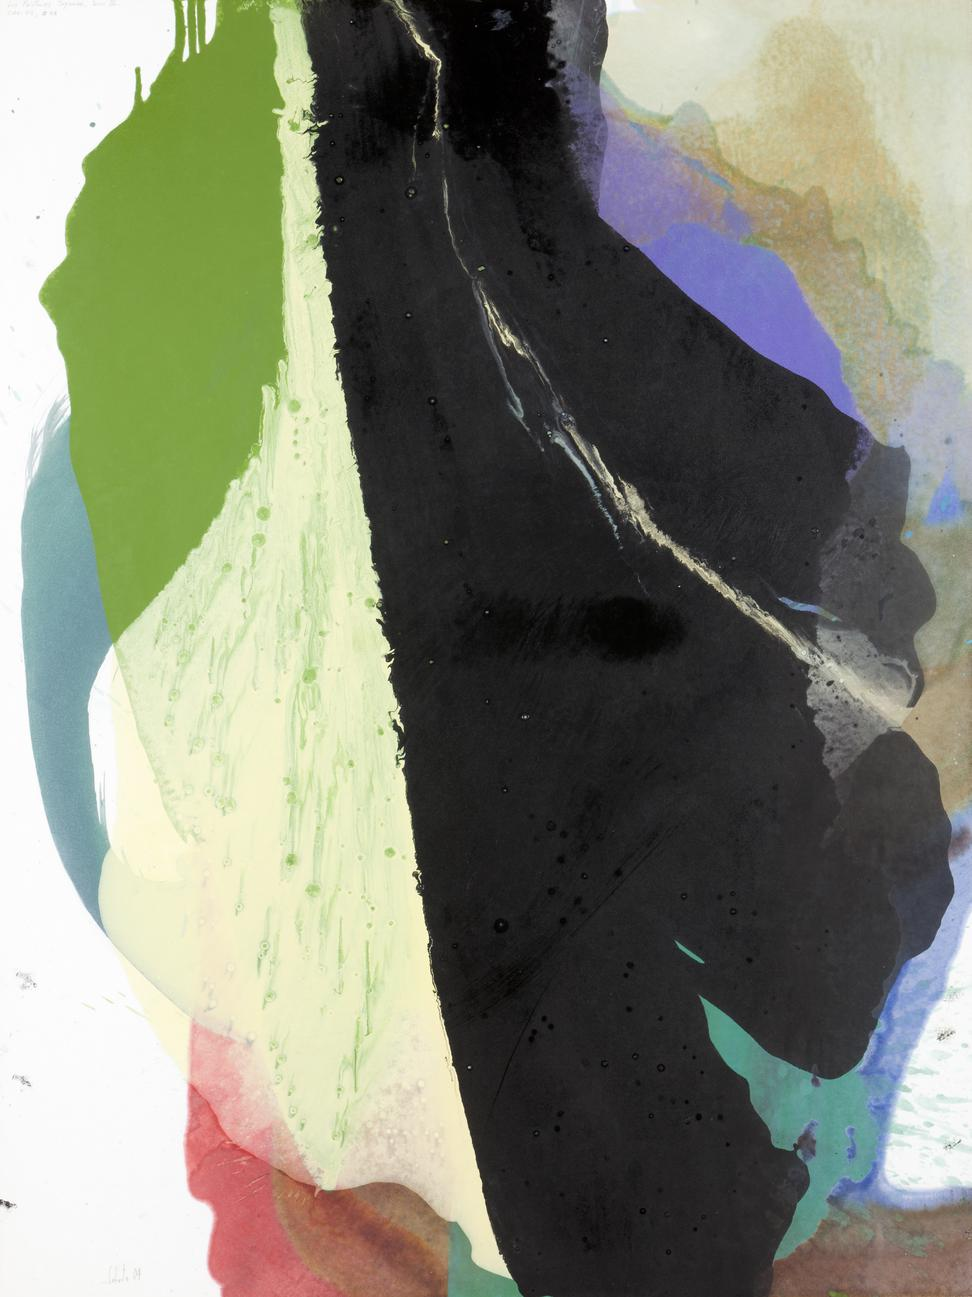 Pedro Cabrita Reis-Les Peintures Joyeuses, Serie III, #13-2004